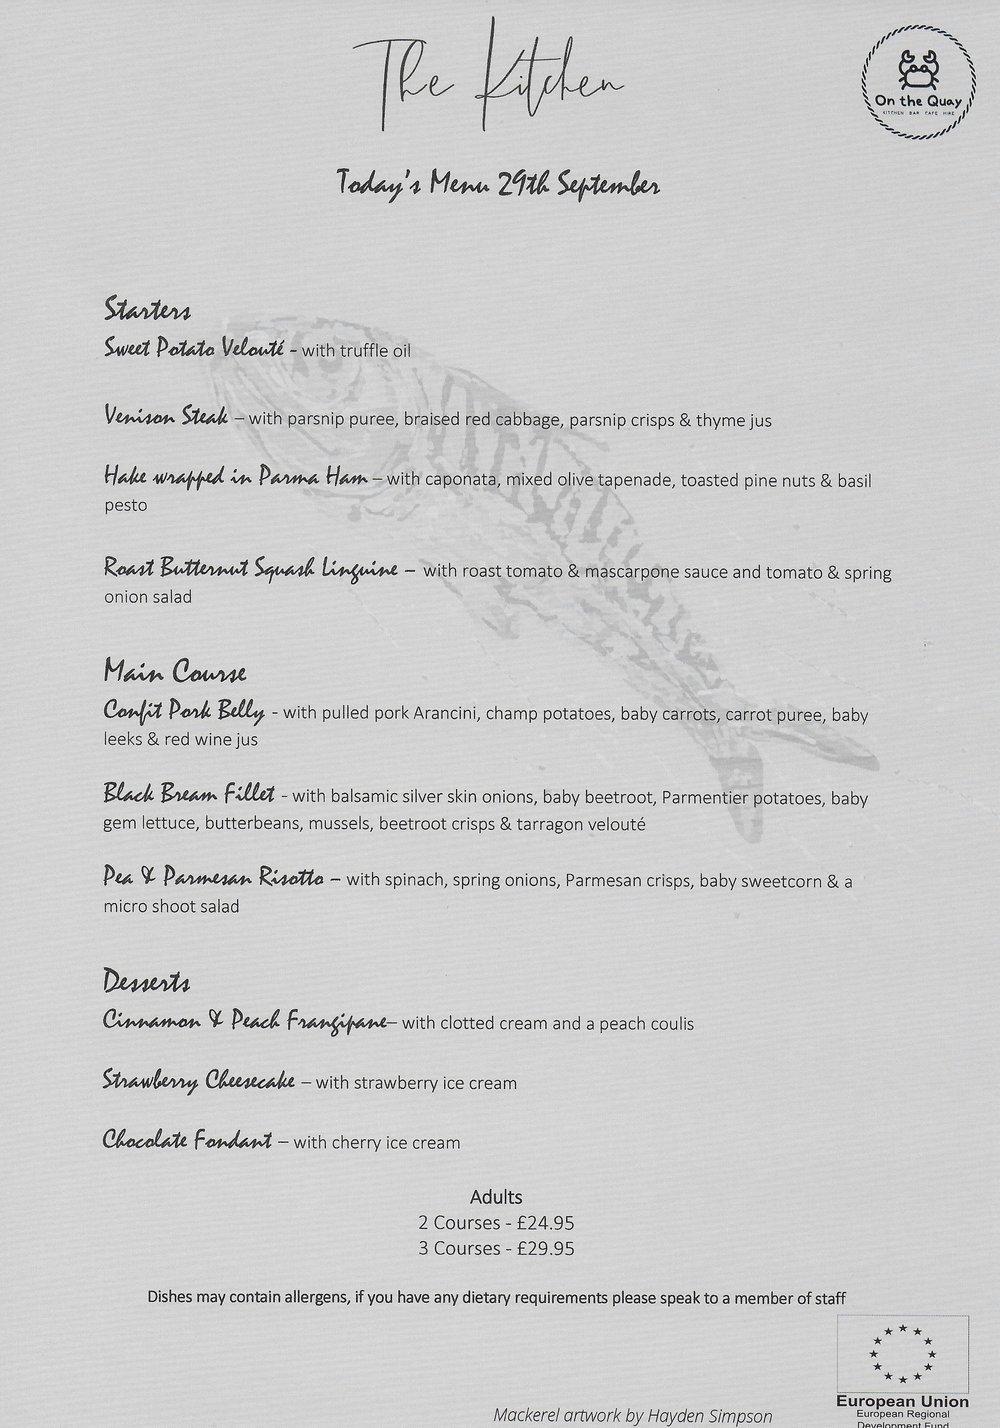 dinner menu 29-9-18.jpeg